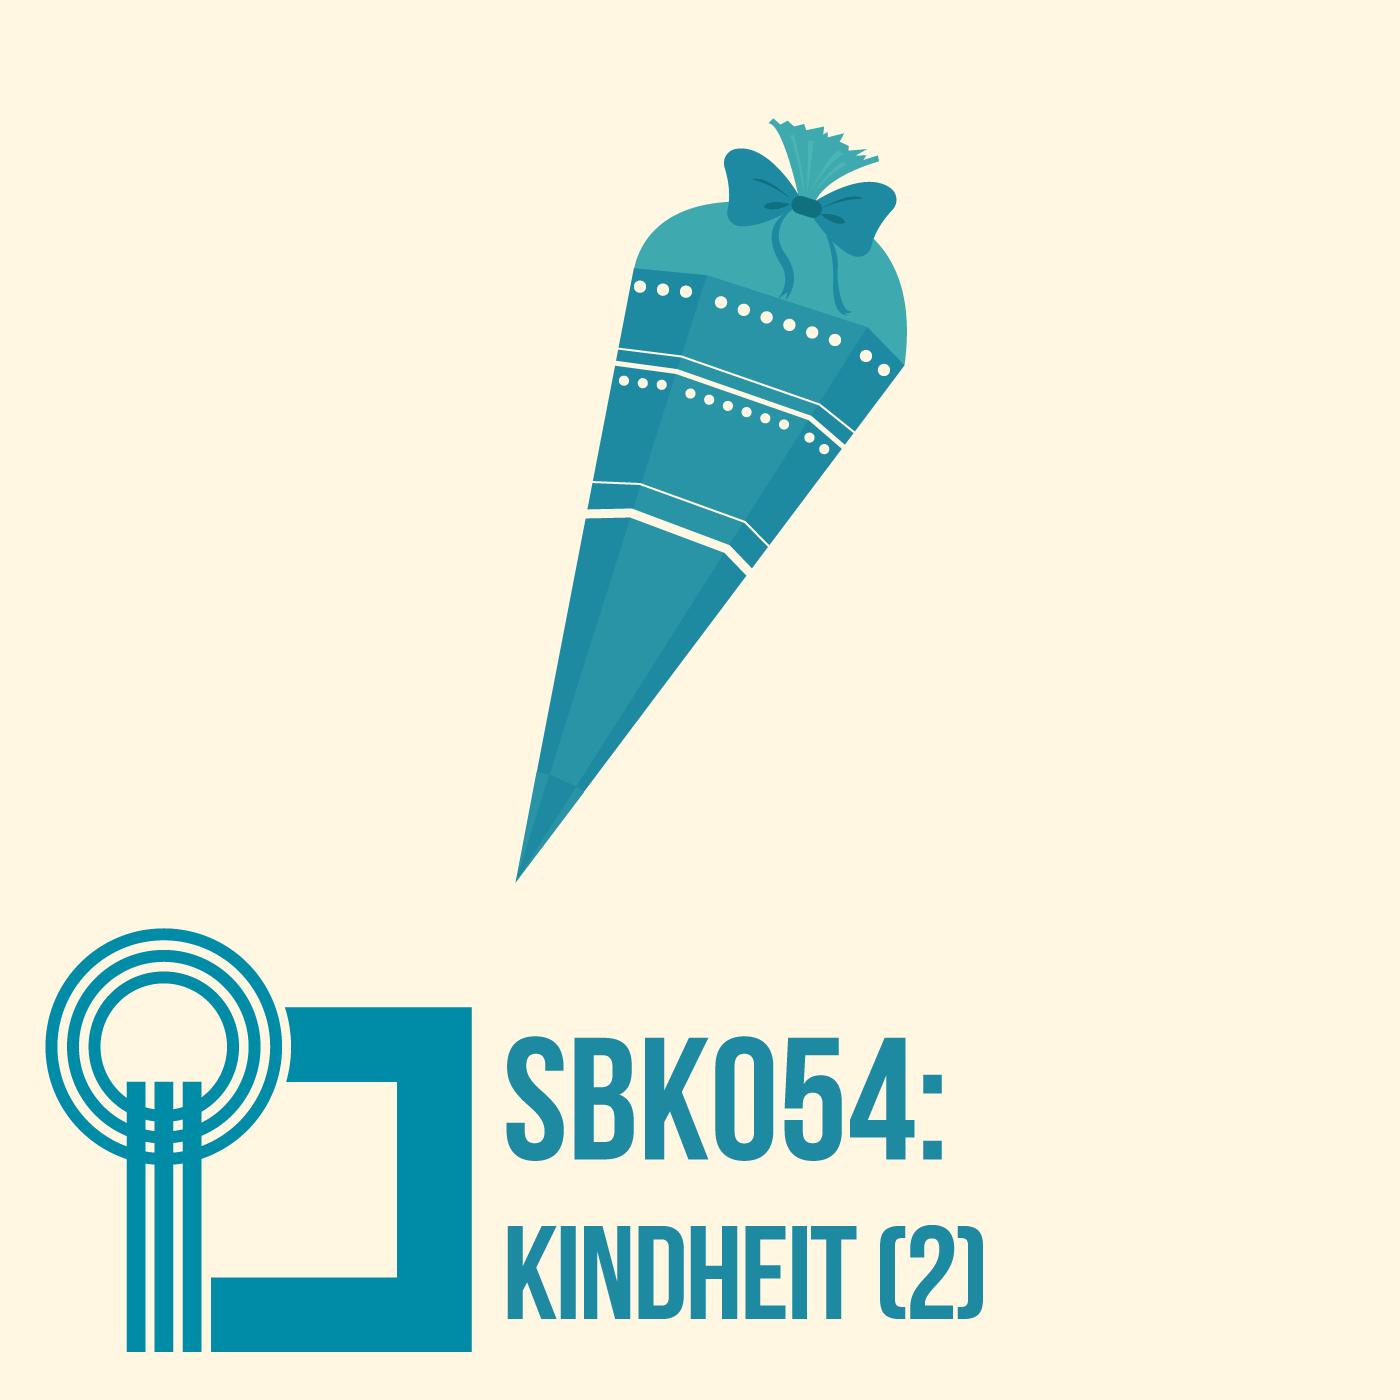 SBK054 Kindheit (2)